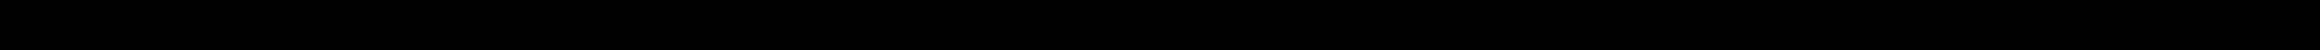 BOSCH 46750241, 60815649, 0 258 986 615, LS 6190, LSF-4.2 Lambda sonda